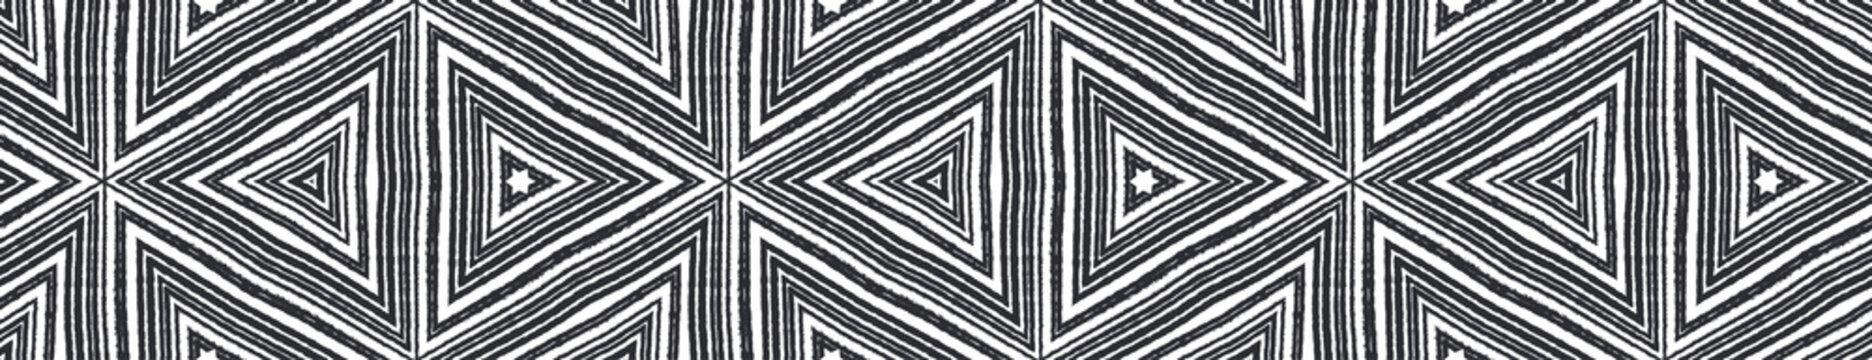 Mosaic seamless border. Black symmetrical